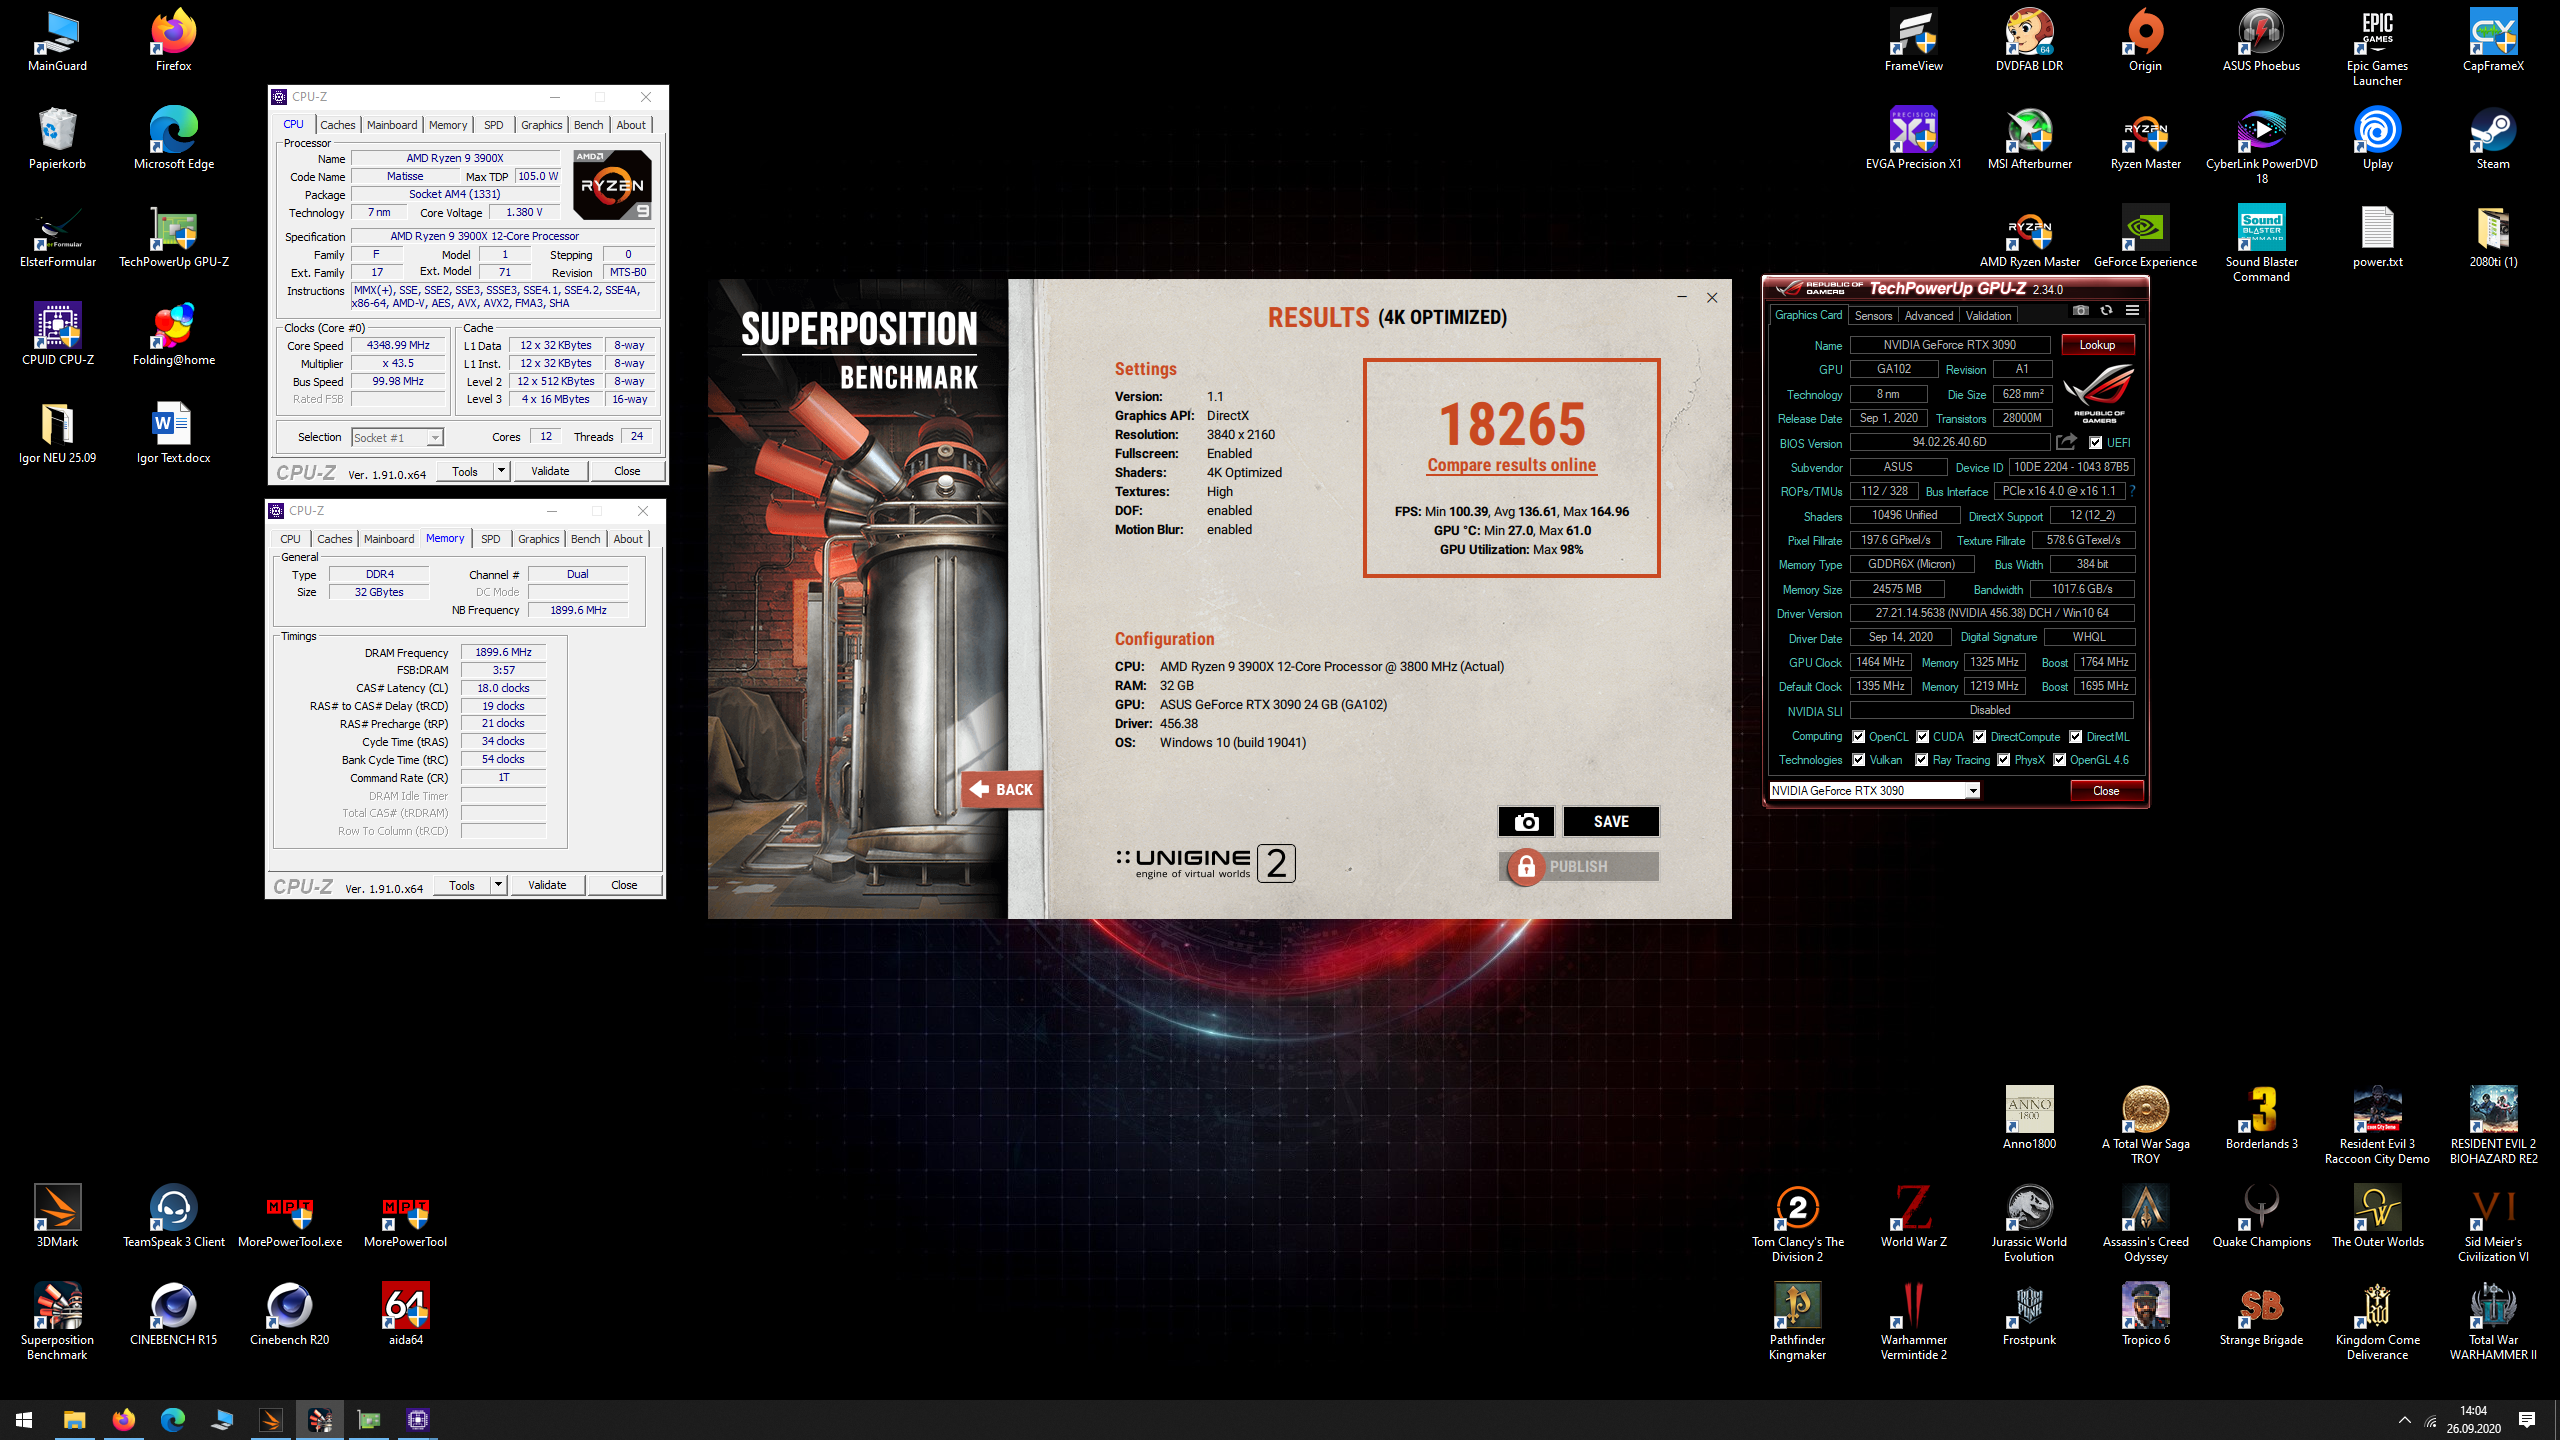 Screenshot (248).png